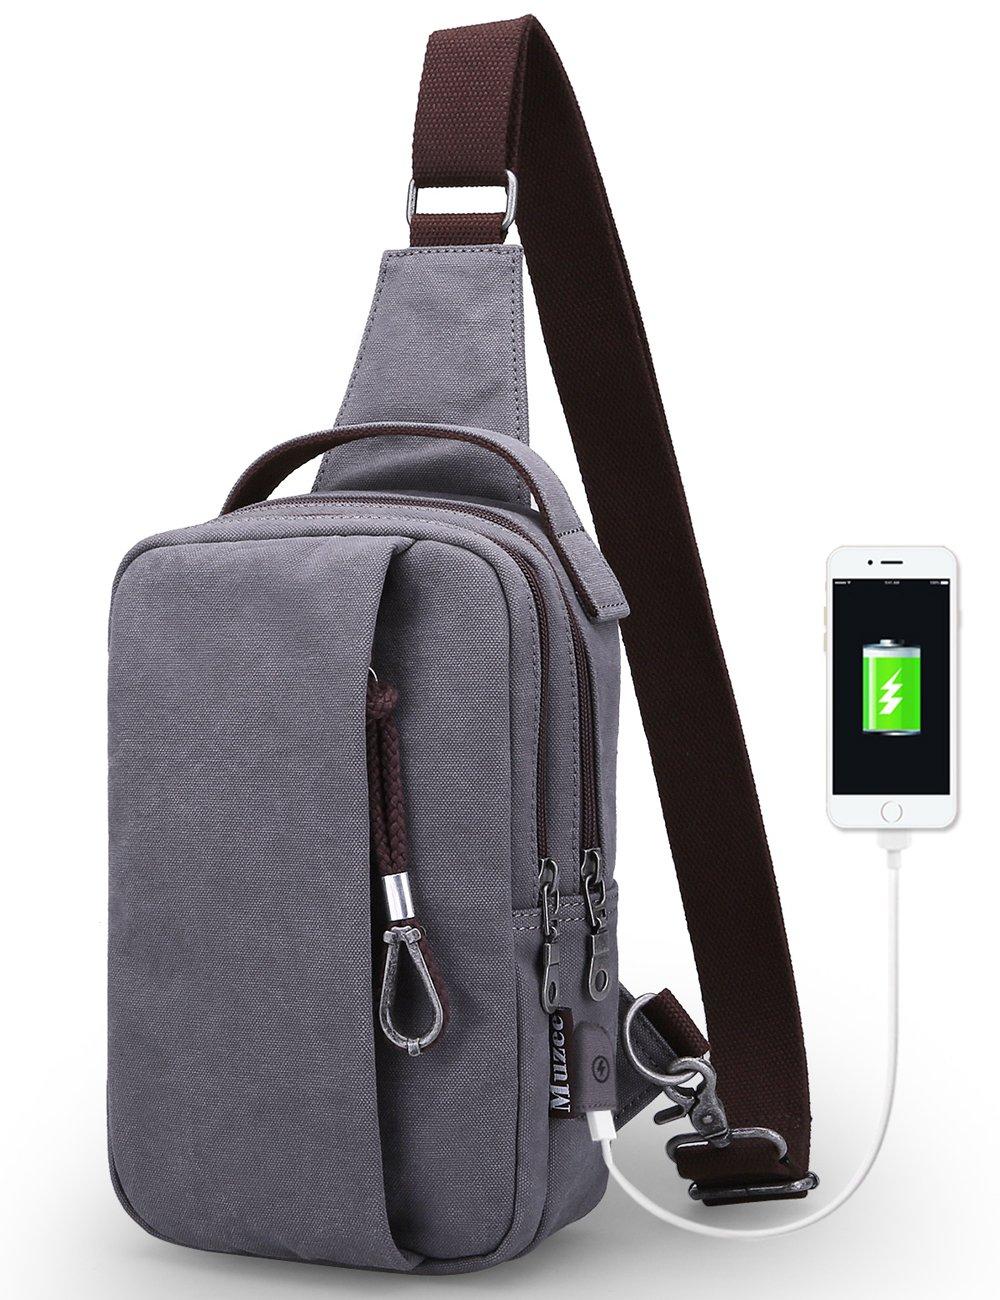 Muzee Sling Bag for Men Chest Shoulder Gym Backpack Outdoor Crossbody Pack with USB Charging Port